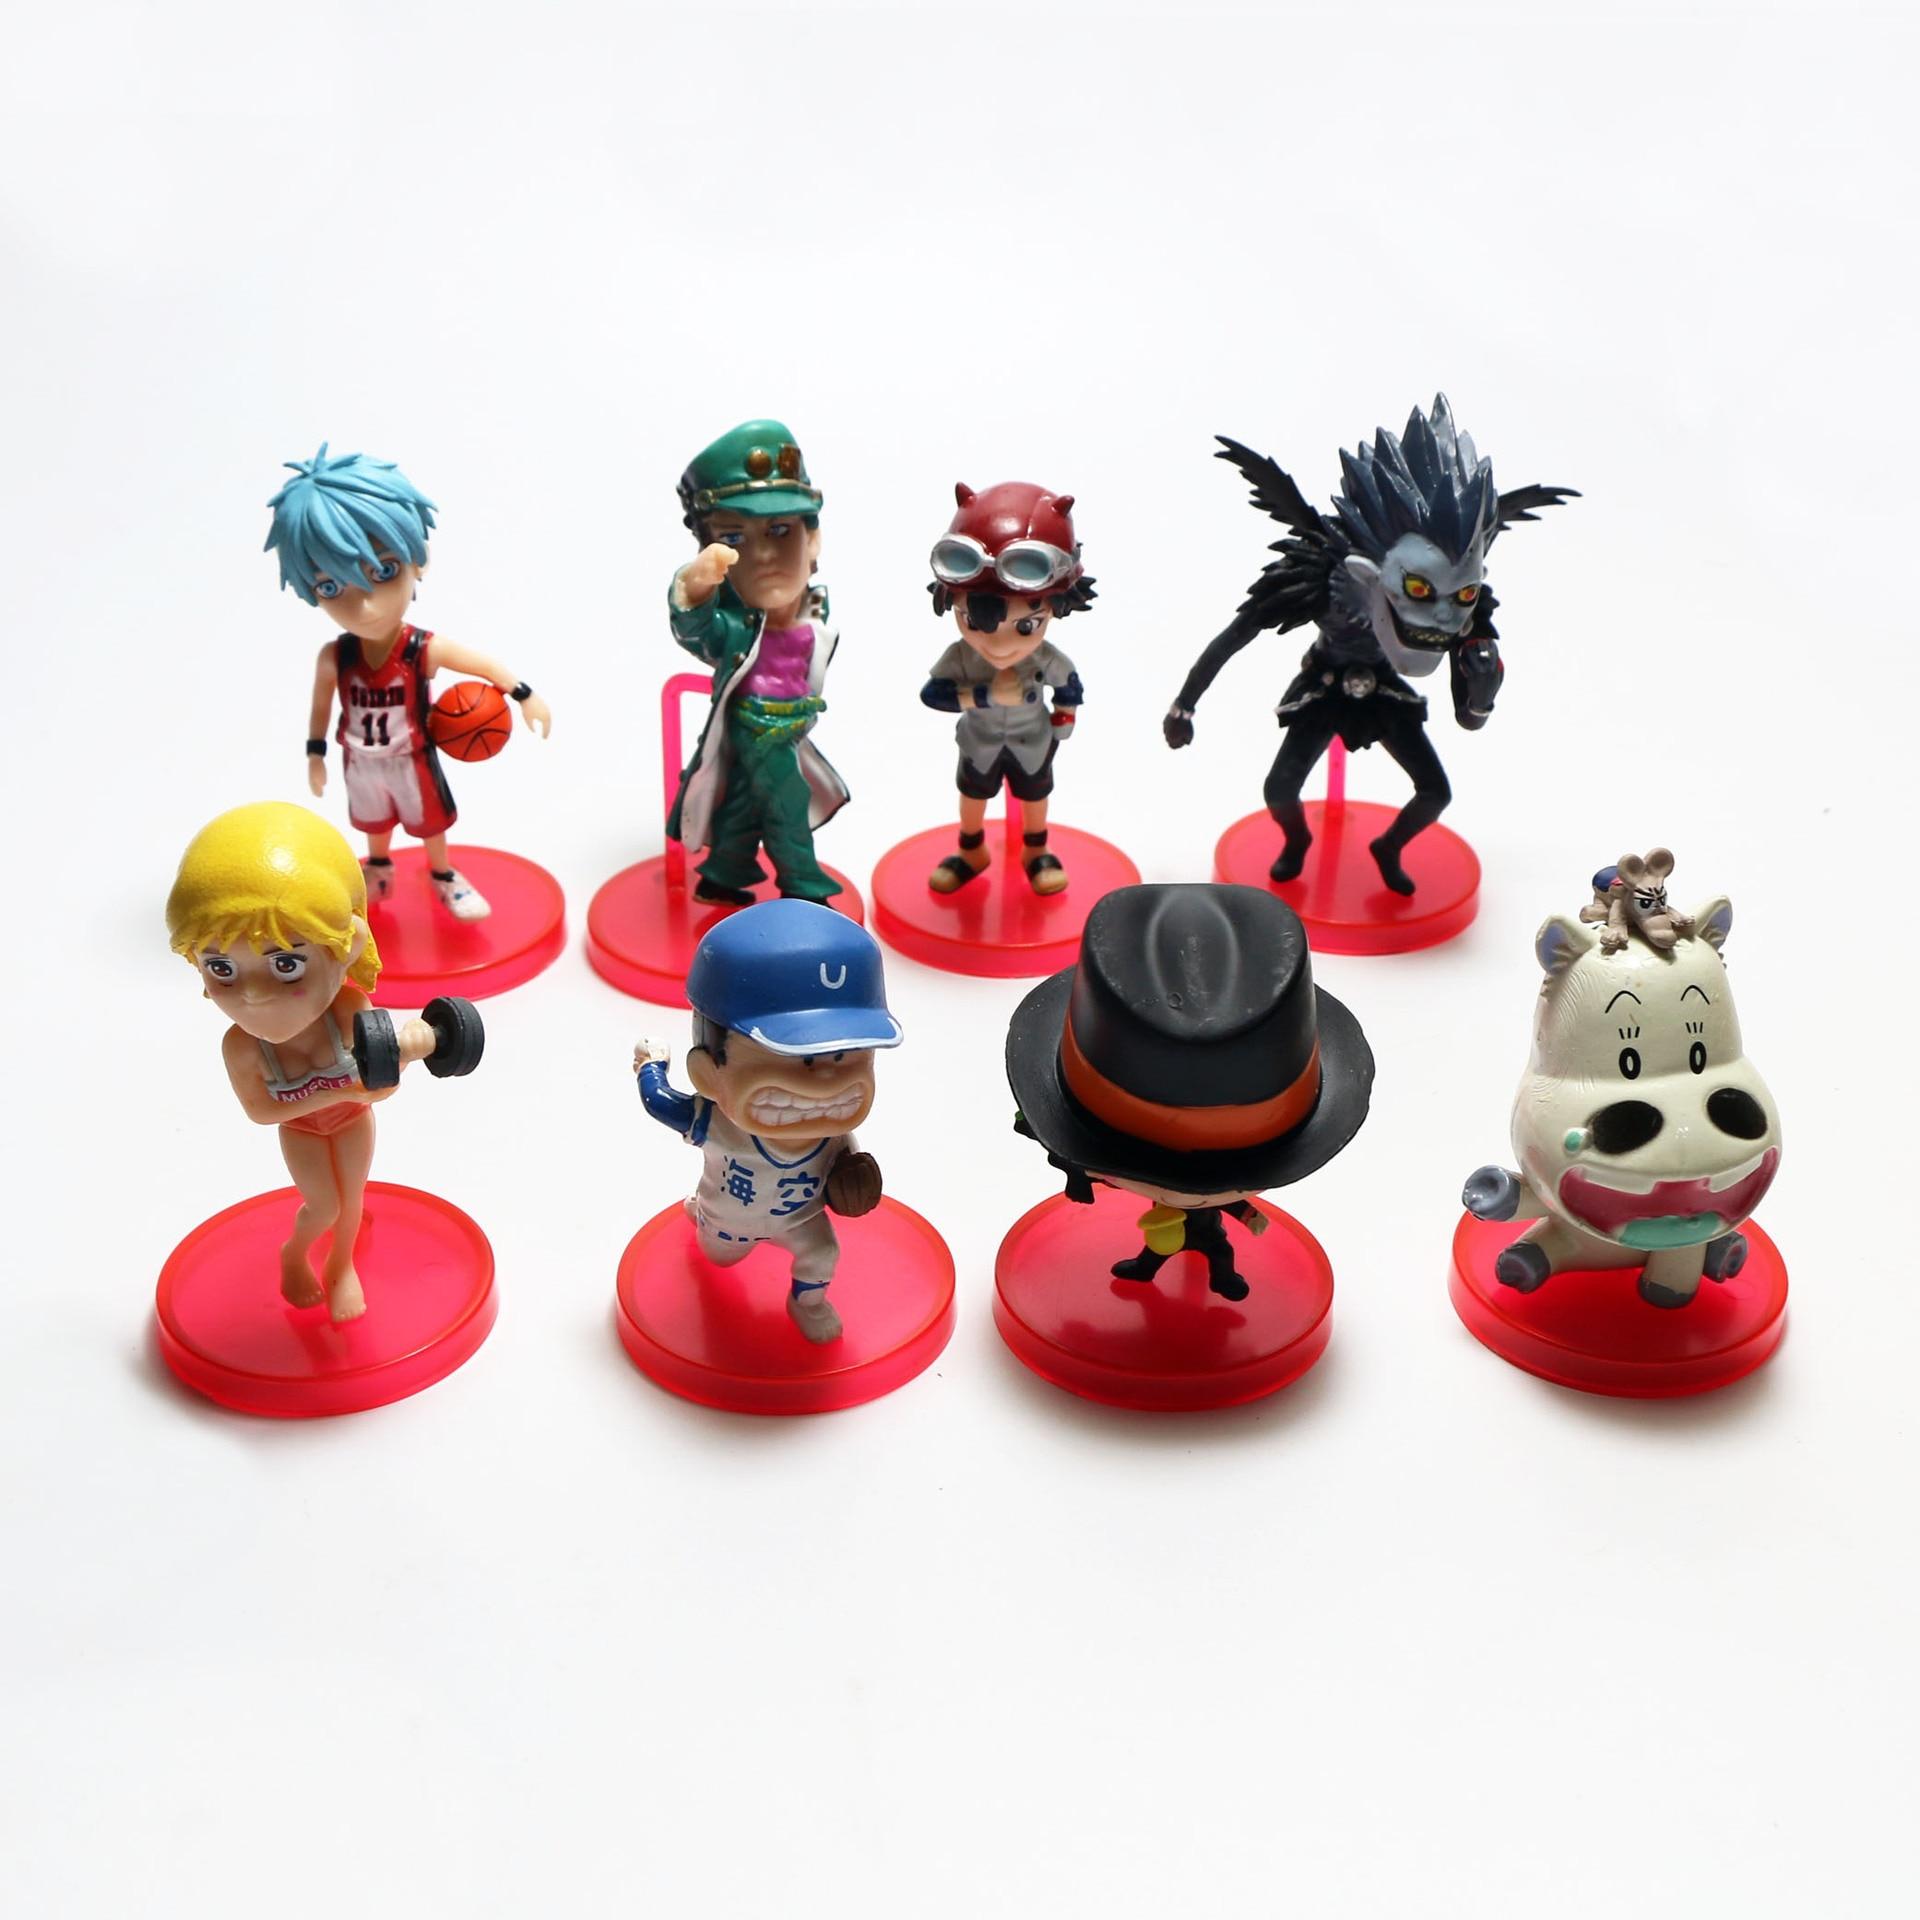 8 anime sports dolls pirates hand dolls model ornaments doll car ornaments cake ornaments toys